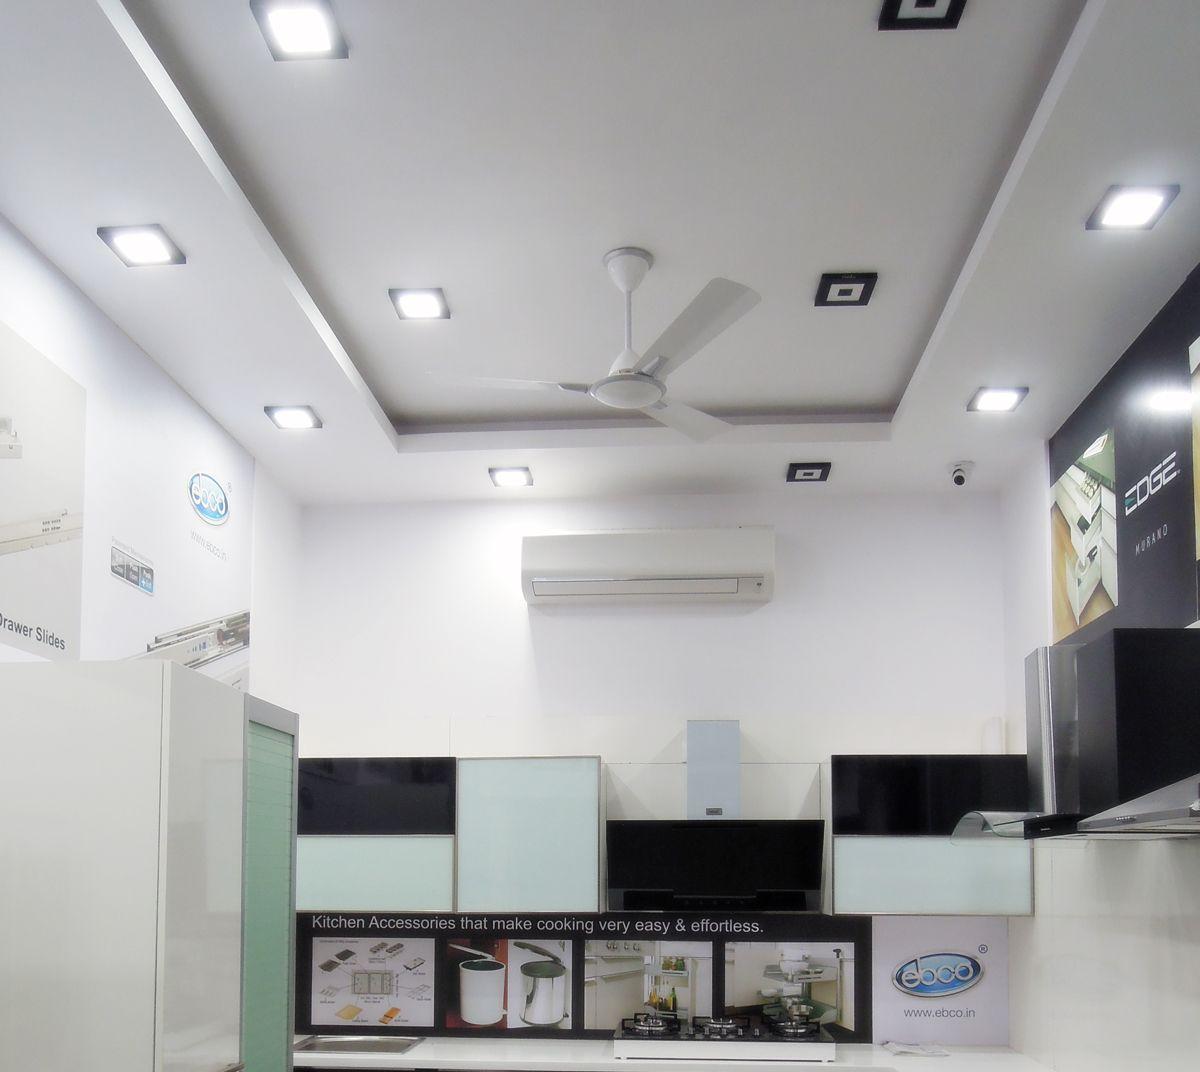 8w Led Recessed Light For False Ceiling